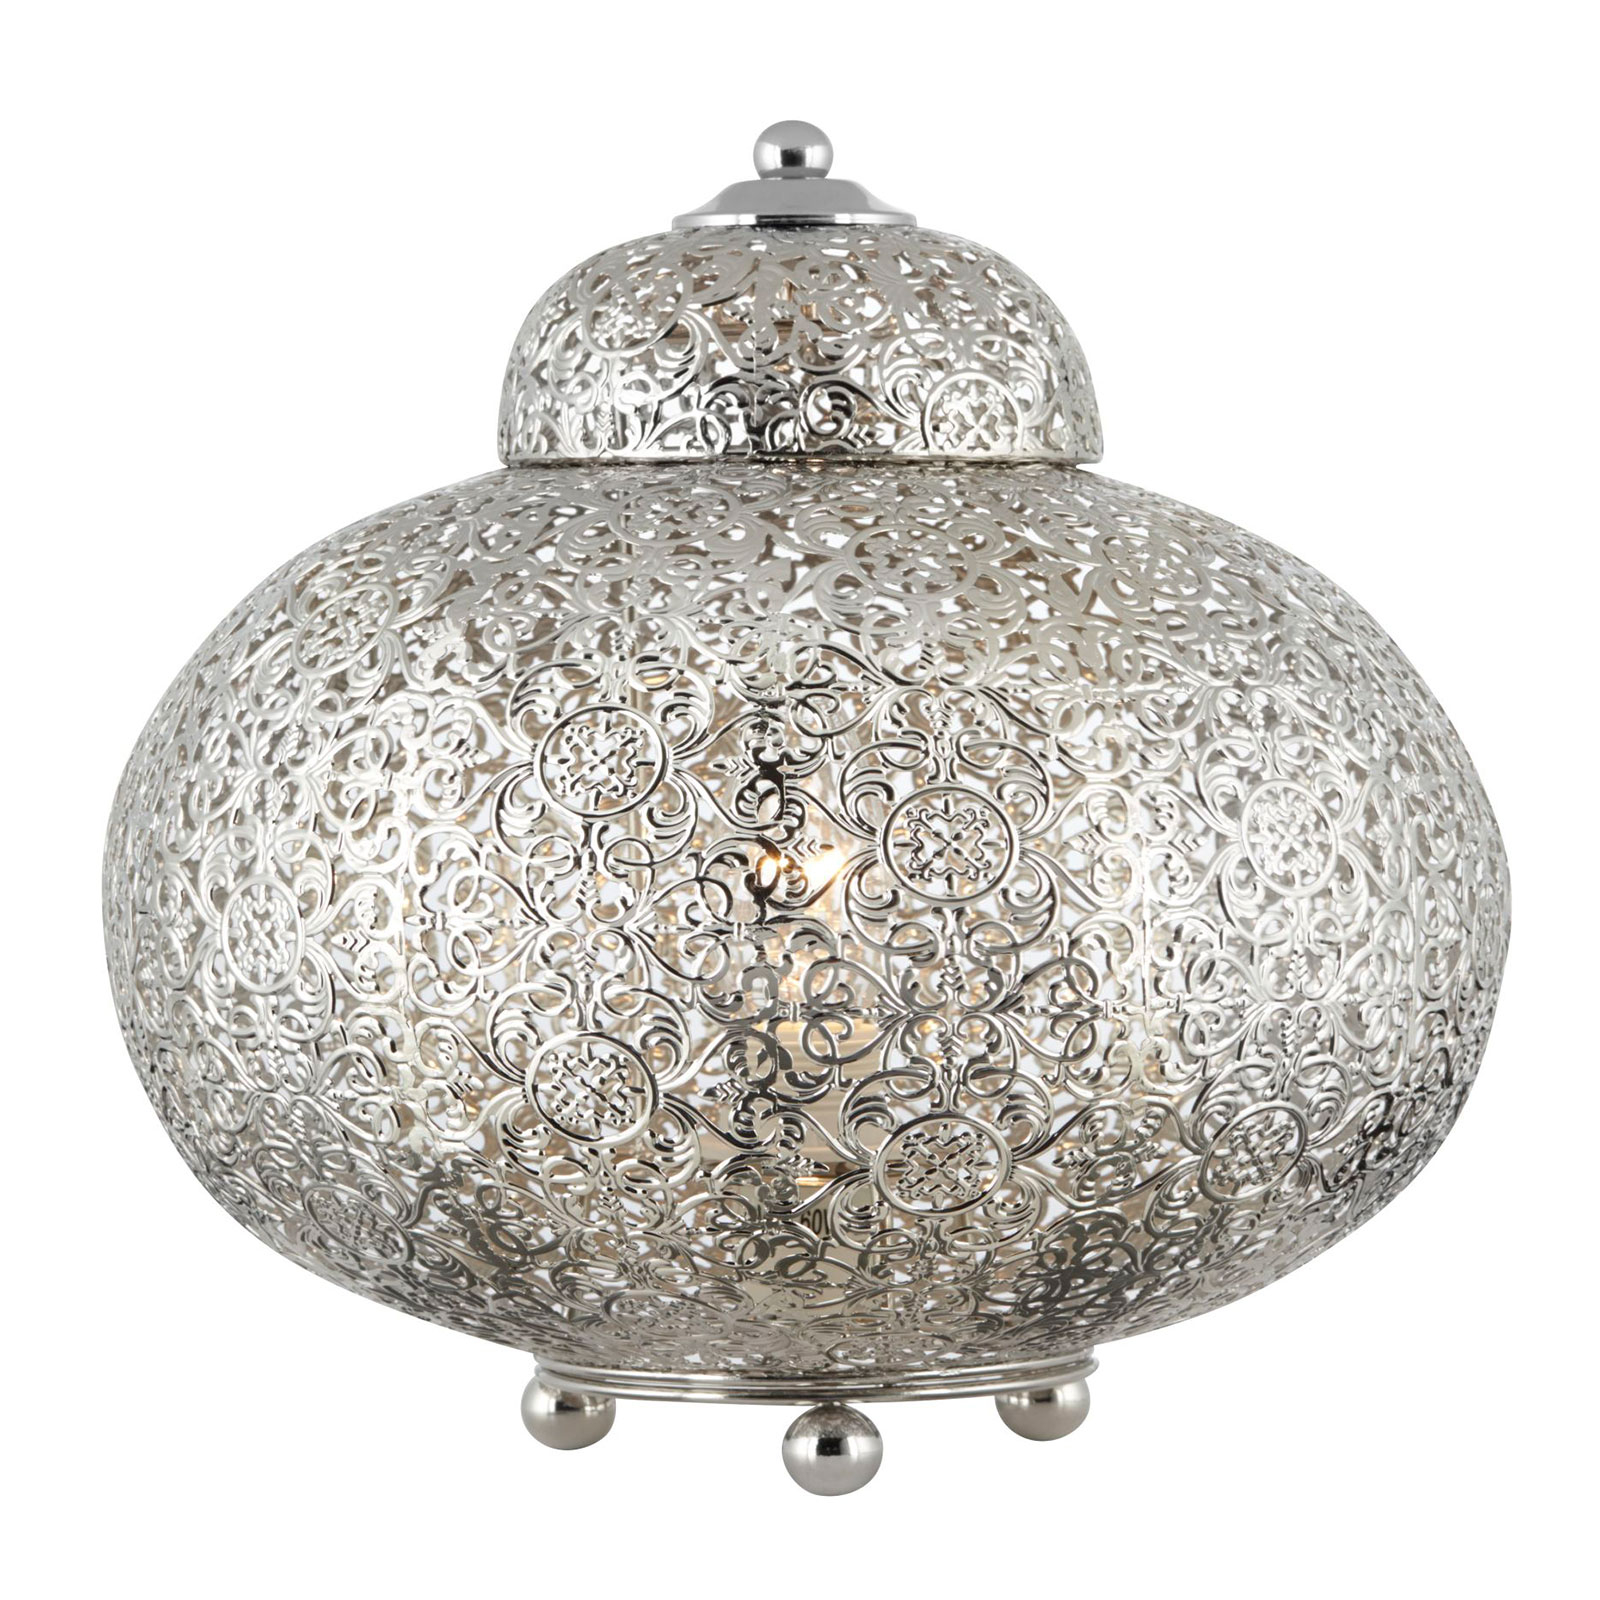 Pöytälamppu Moroccan Fretwork, nikkeli